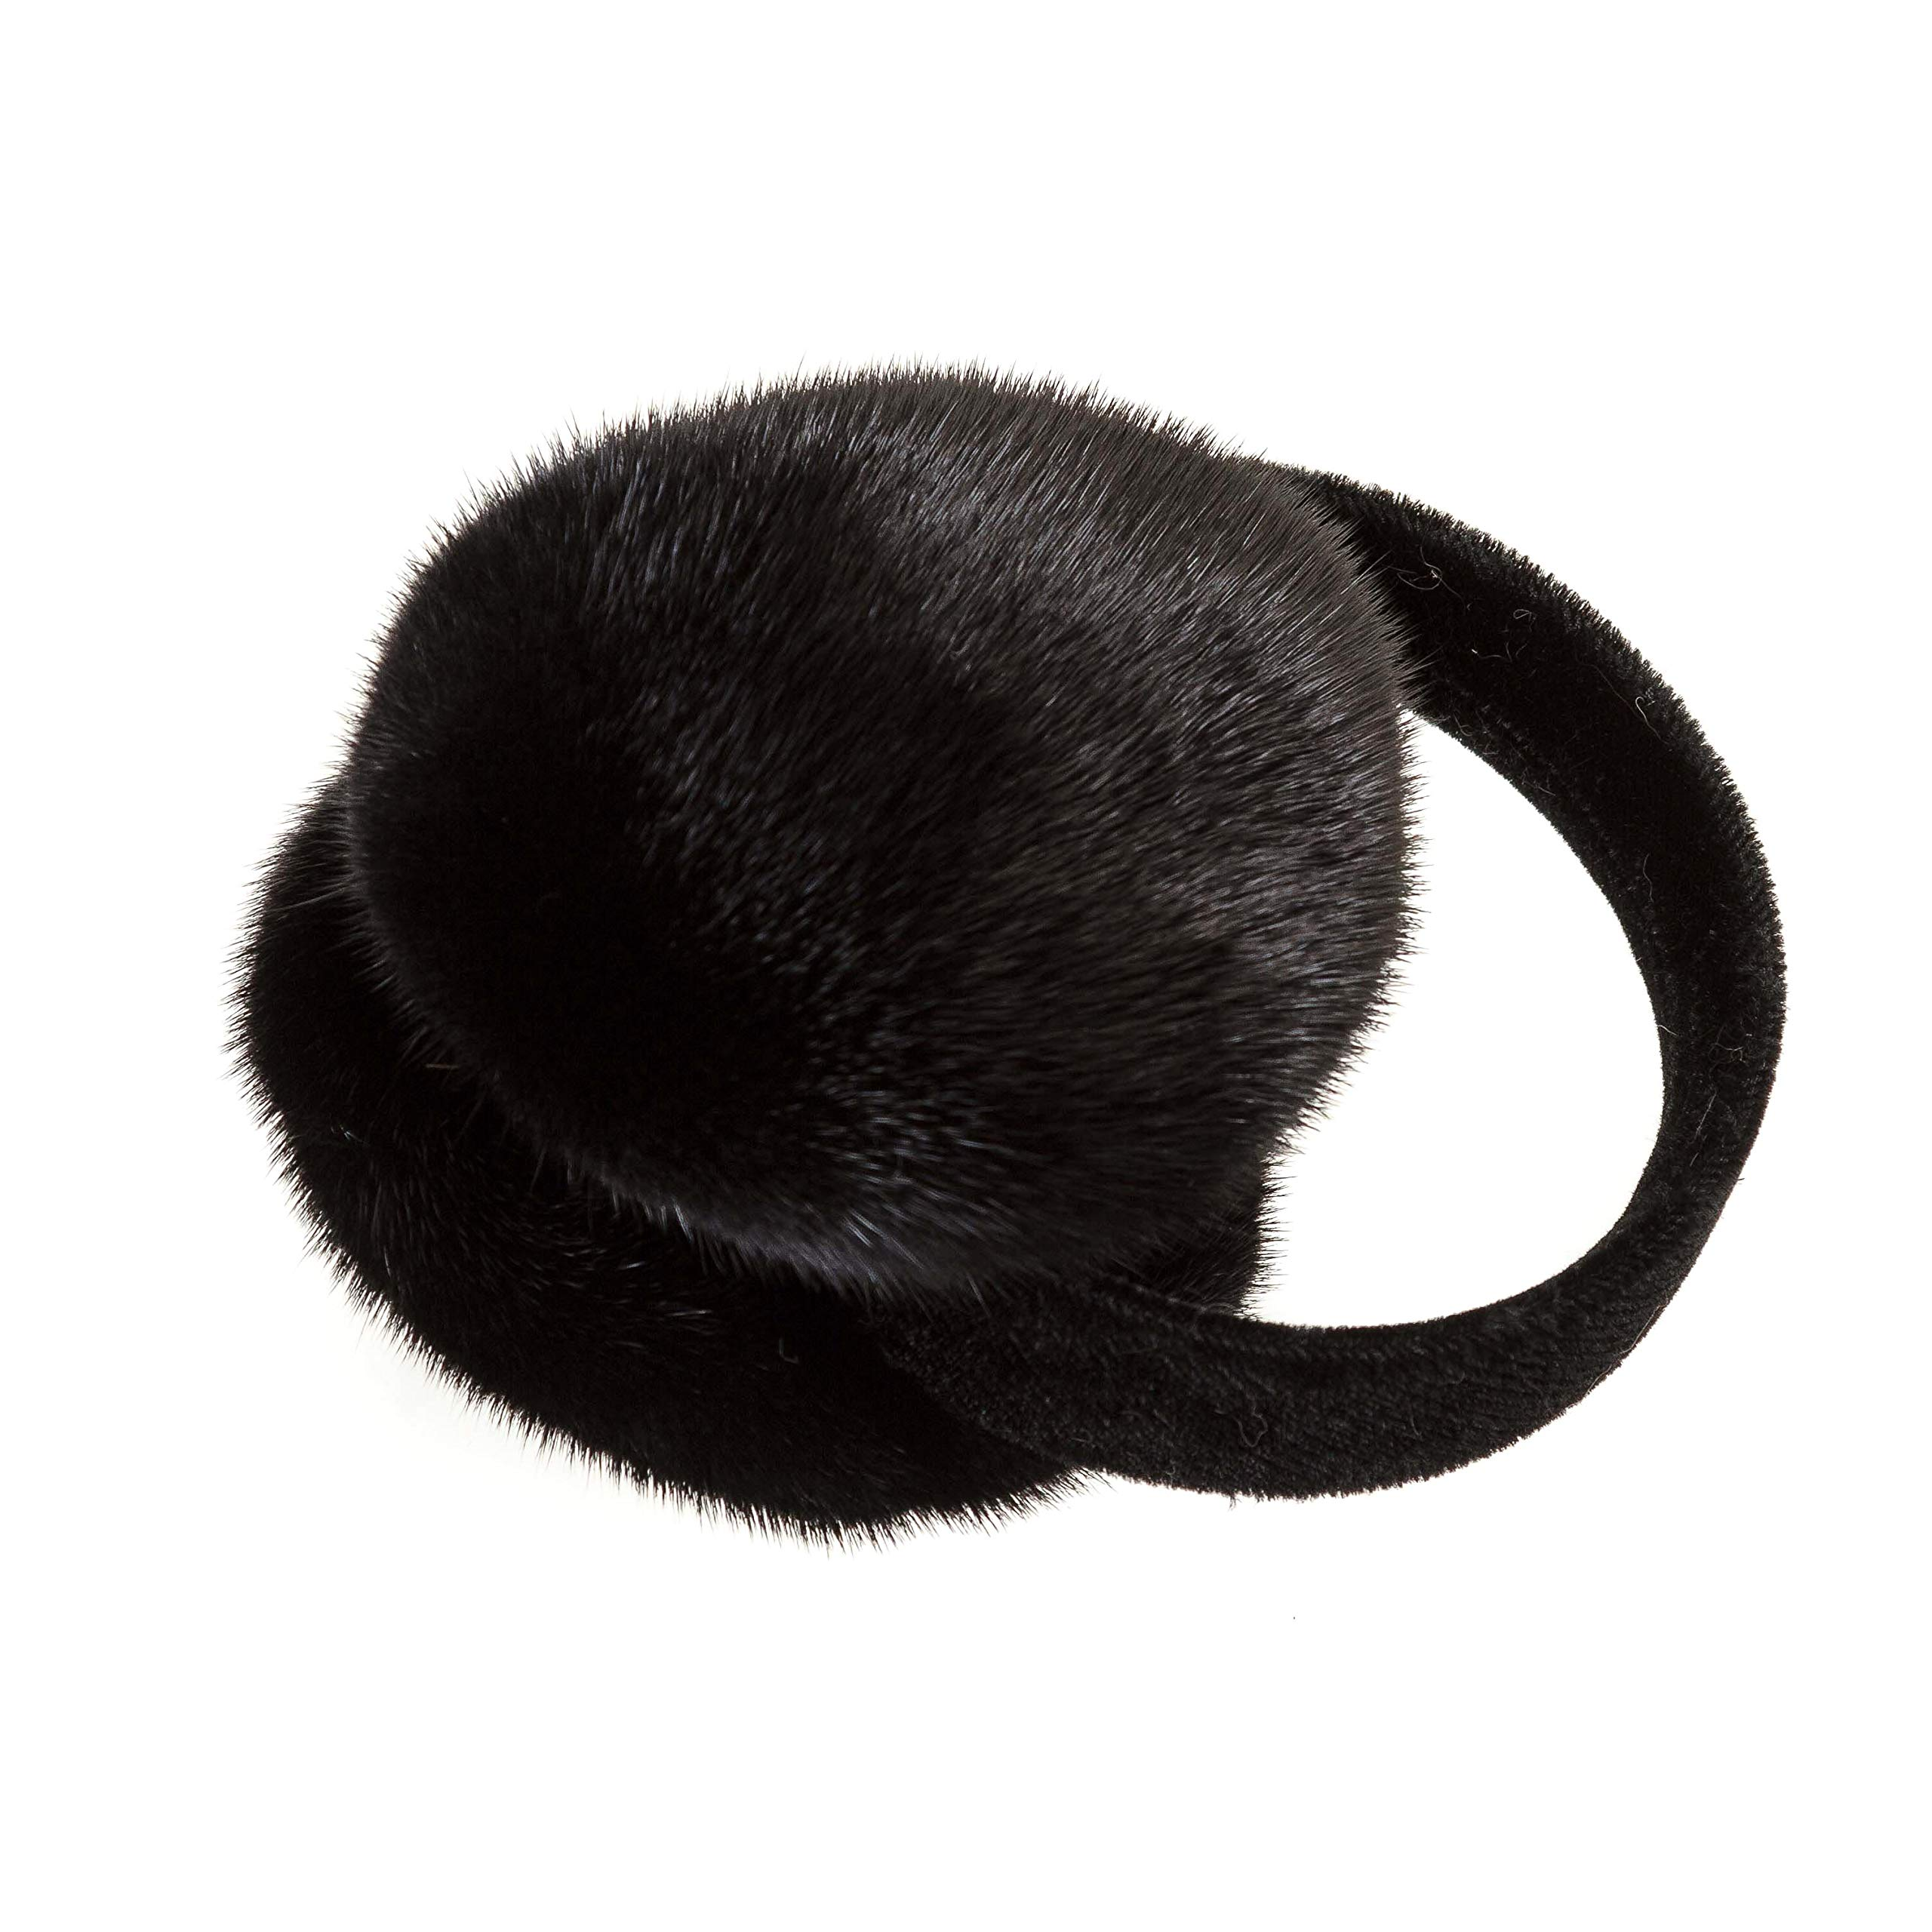 Surell Mink Fur Earmuff with Velvet Band, Ear Warmer, Winter Fashion (Black)